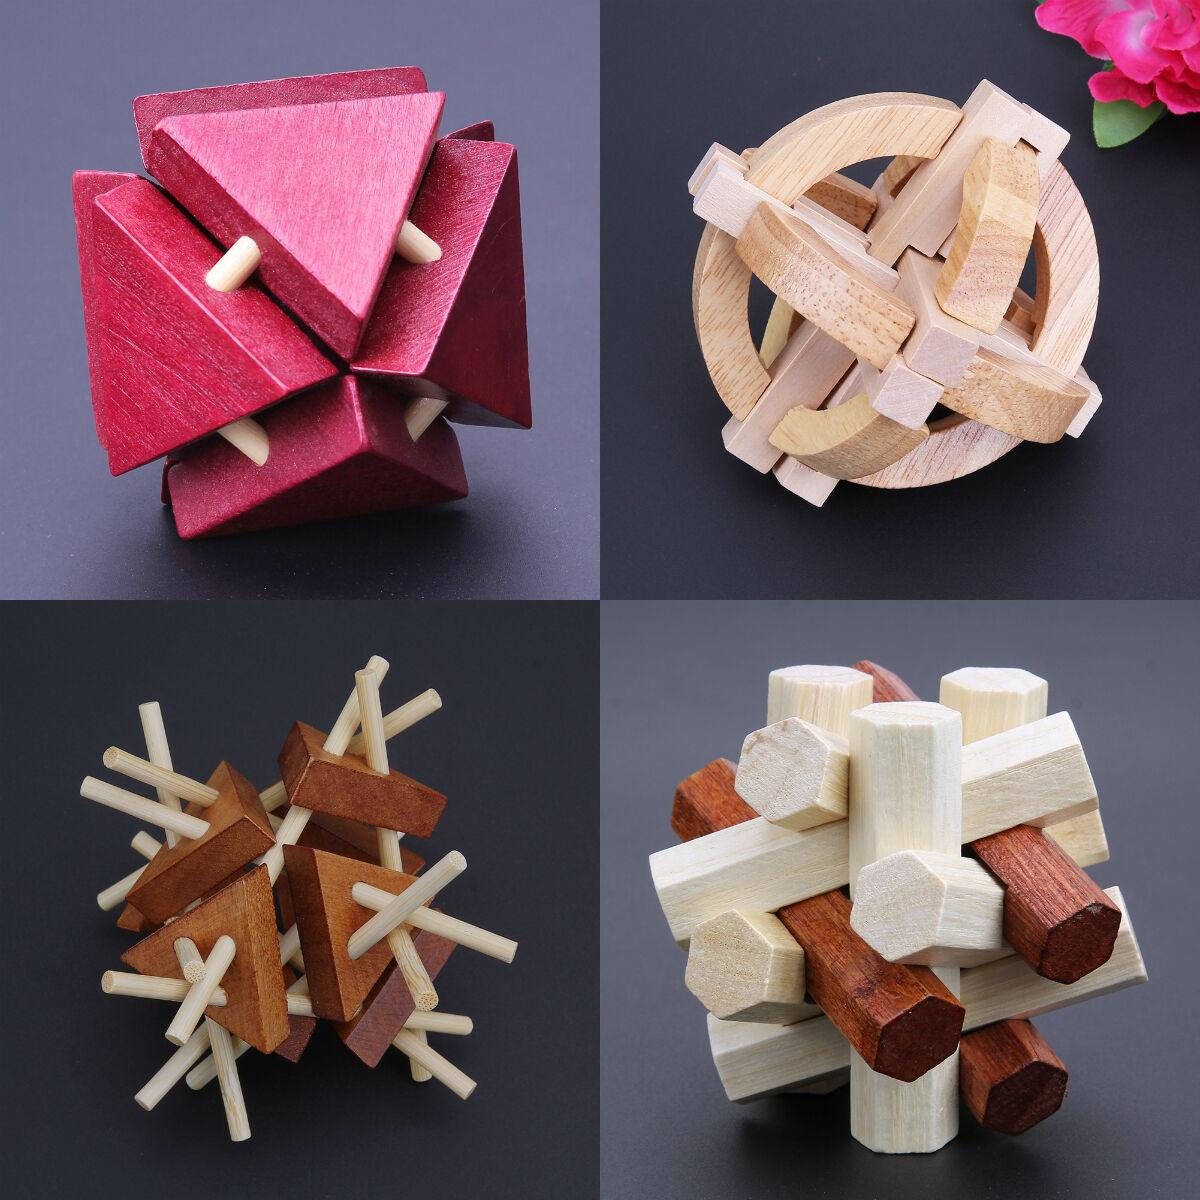 Kongming Luban Lock Block Kids Adult Wood Chinese Puzzle Brain Teaser Magic Toys